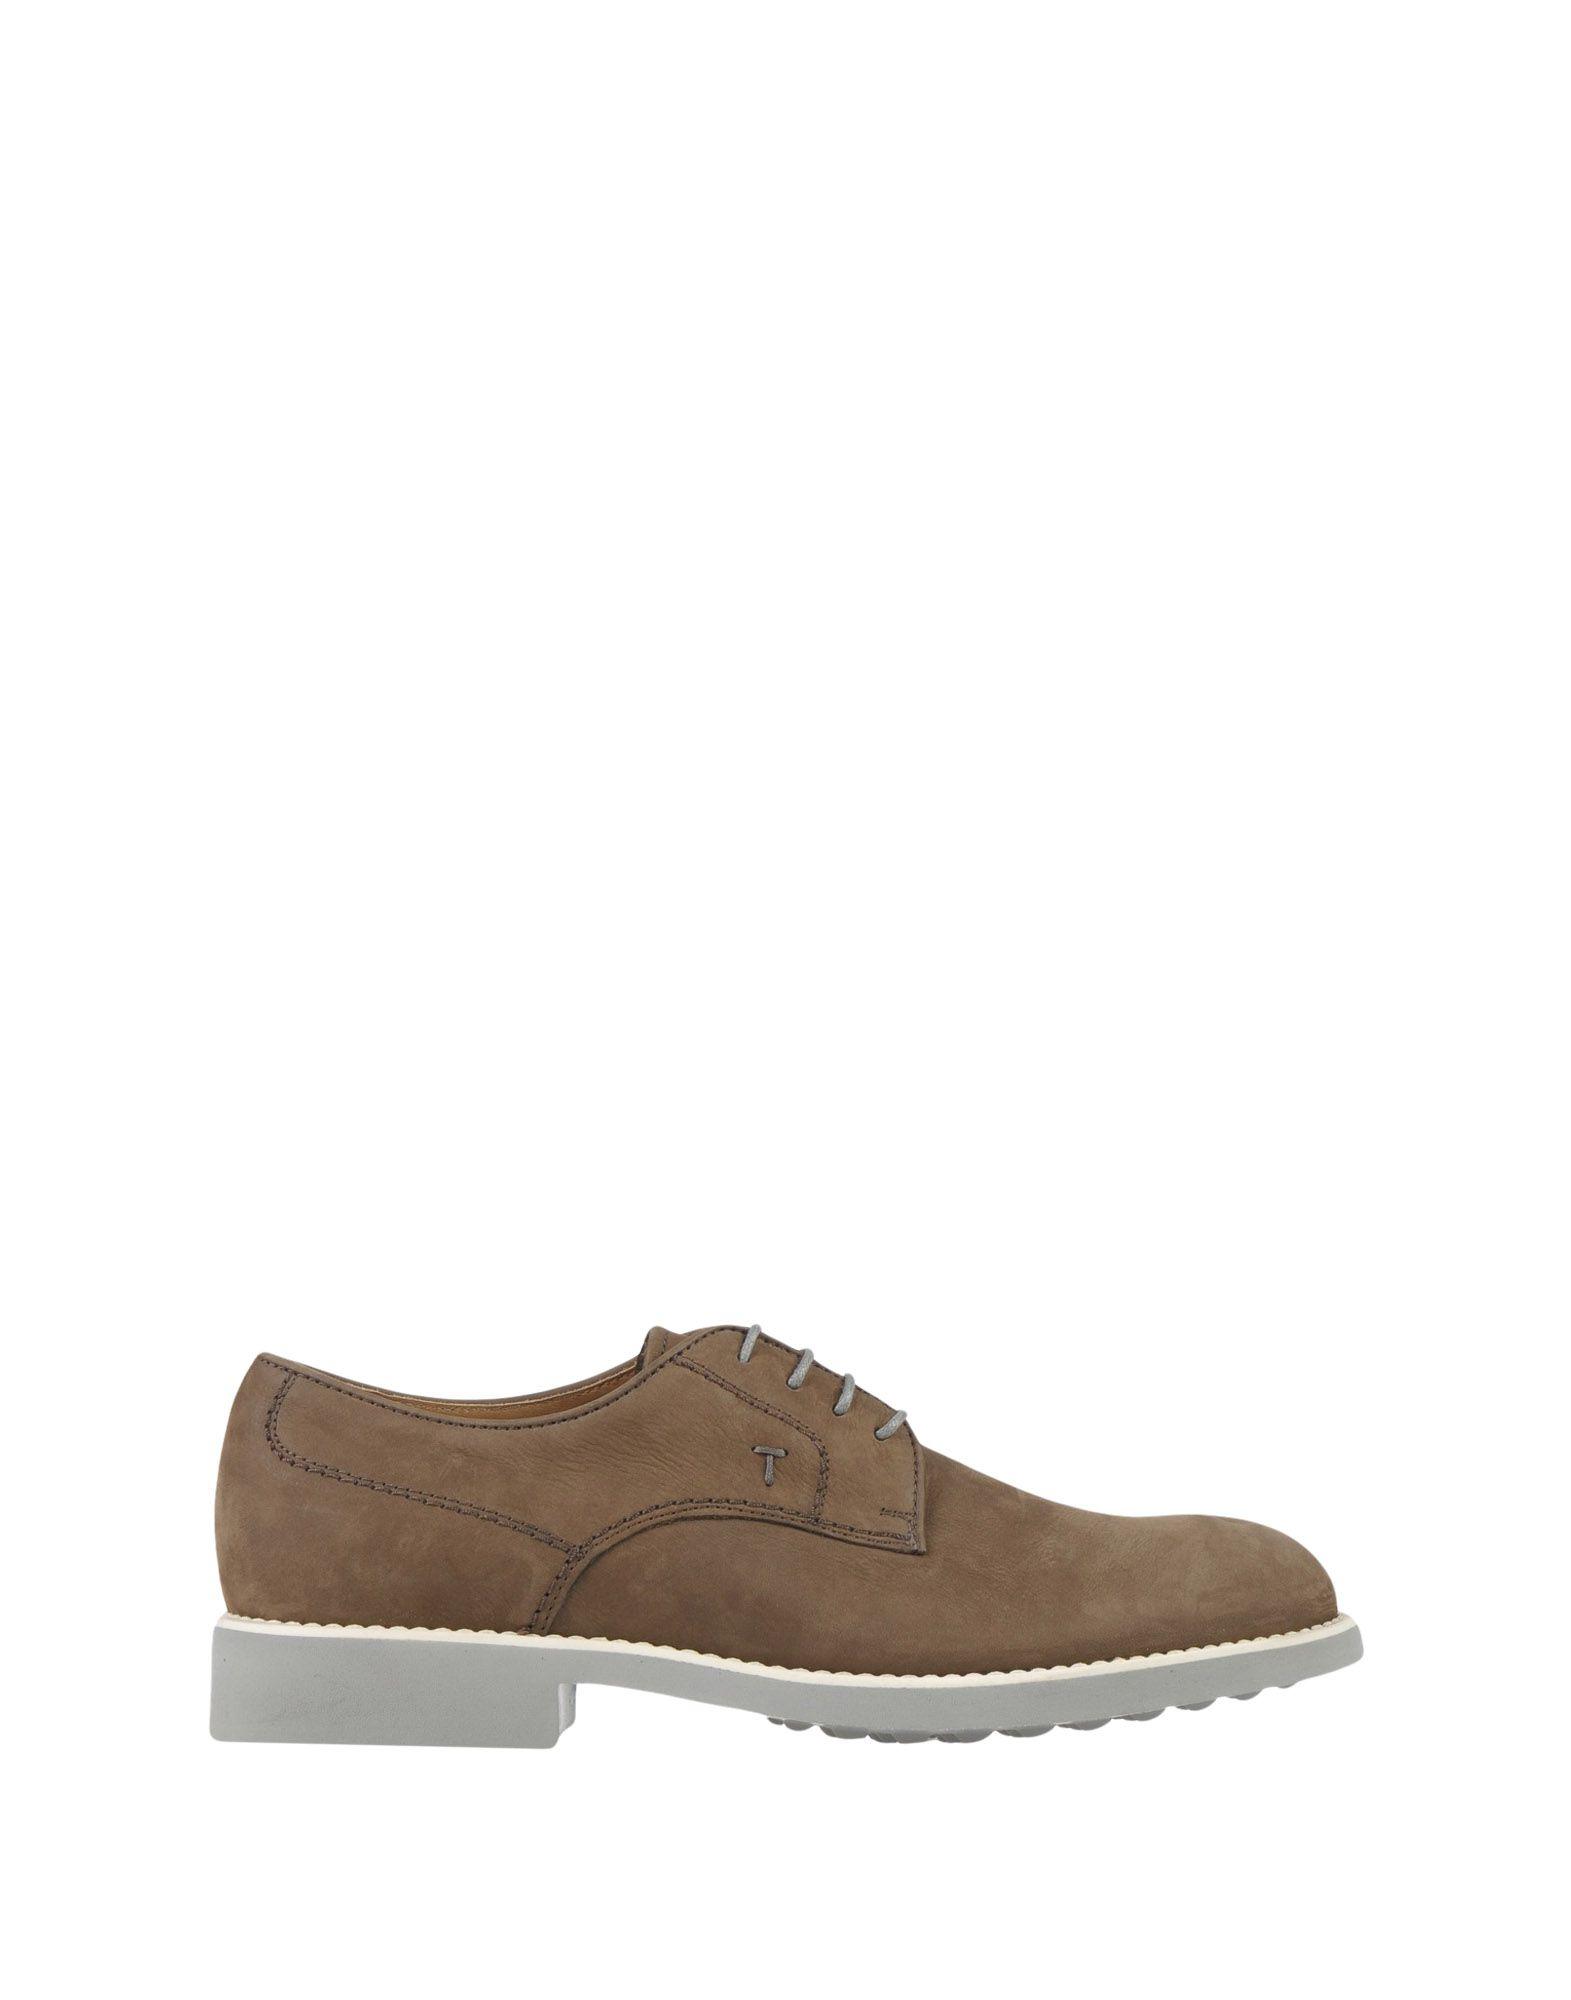 Tod's 11397932CR Schnürschuhe Herren  11397932CR Tod's Gute Qualität beliebte Schuhe 93f42b